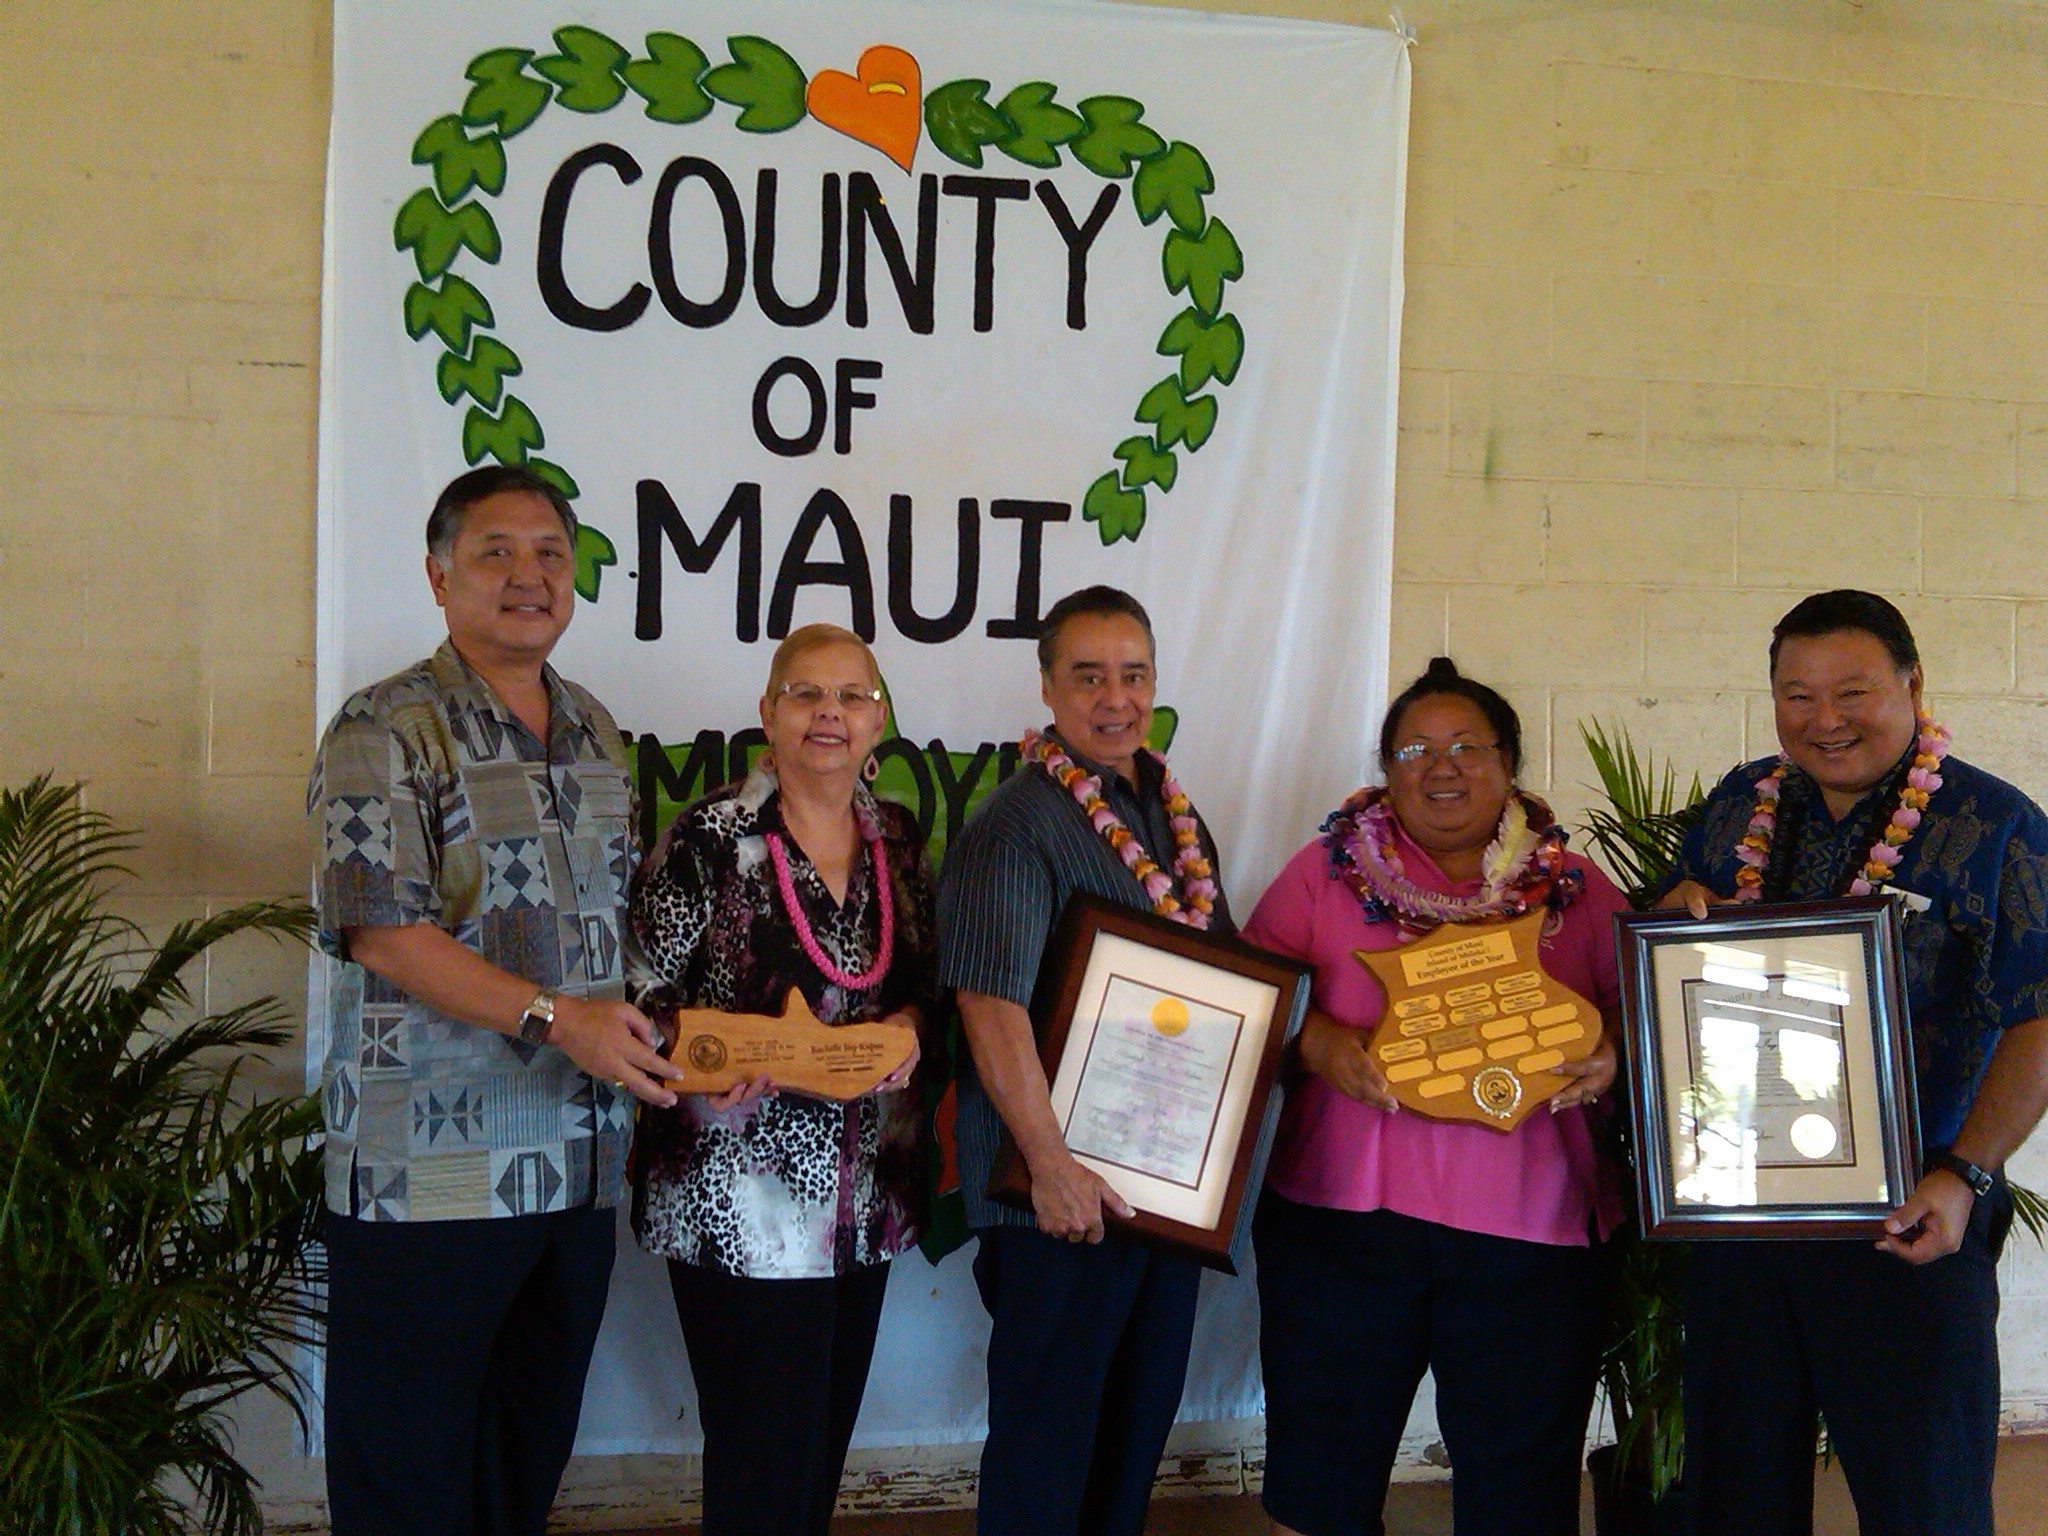 Left to right: Council members Riki Hokama and Gladys Baisa, Council Chair Danny Mateo, Employee of the Year Rachelle Ing-Kupau and Mayor Alan Arakawa. Photo courtesy Janice Shishido.